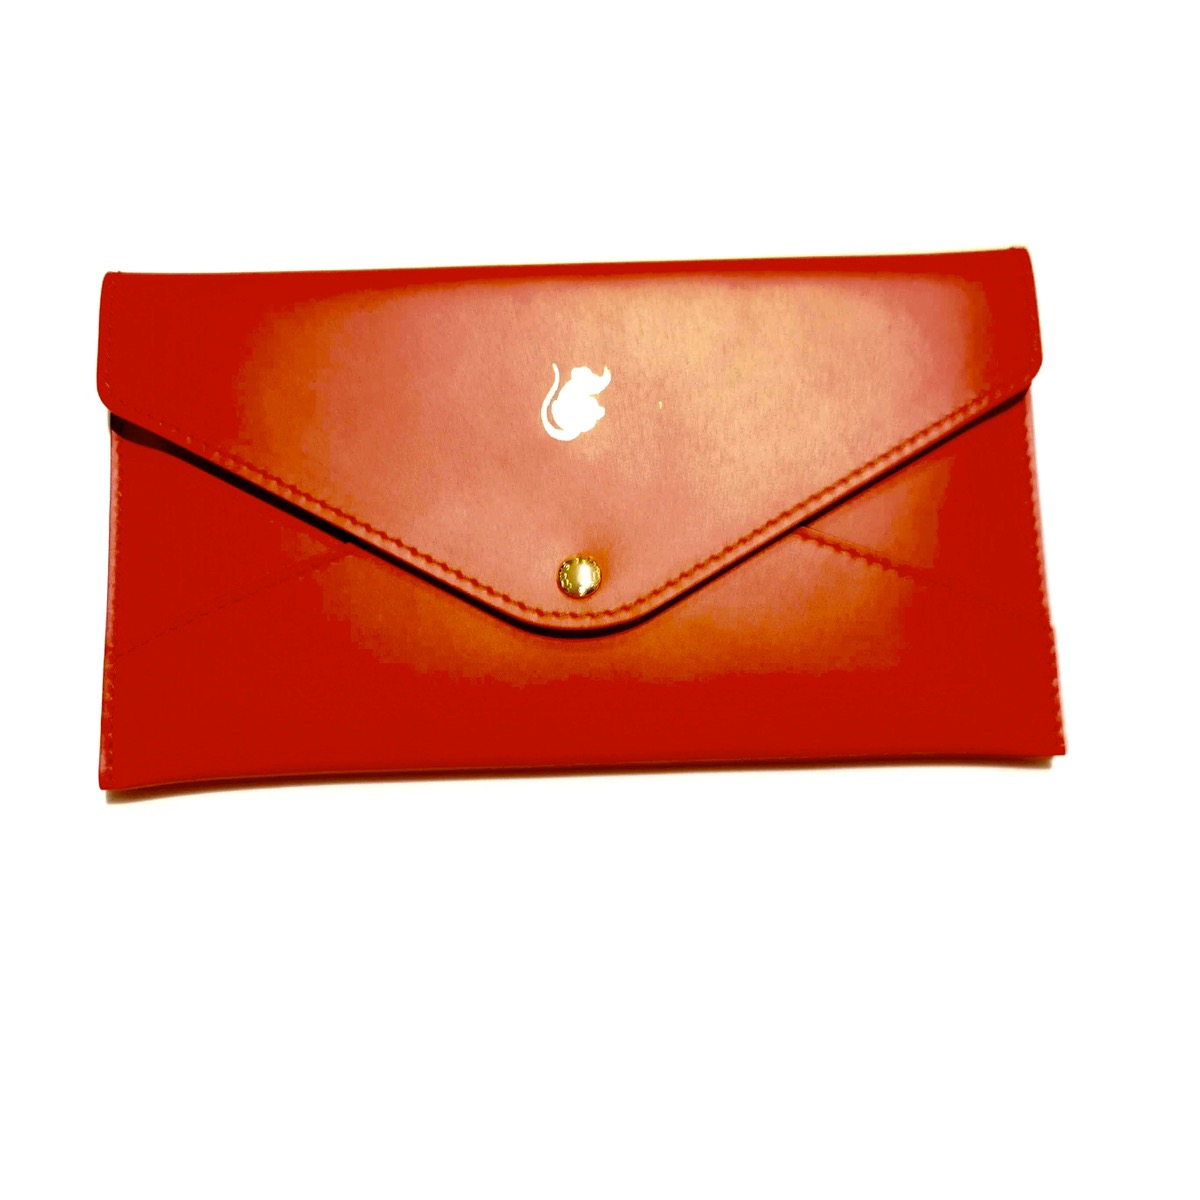 Louis Vuitton Louis Vuitton Leather Red Packet Envelope Grailed